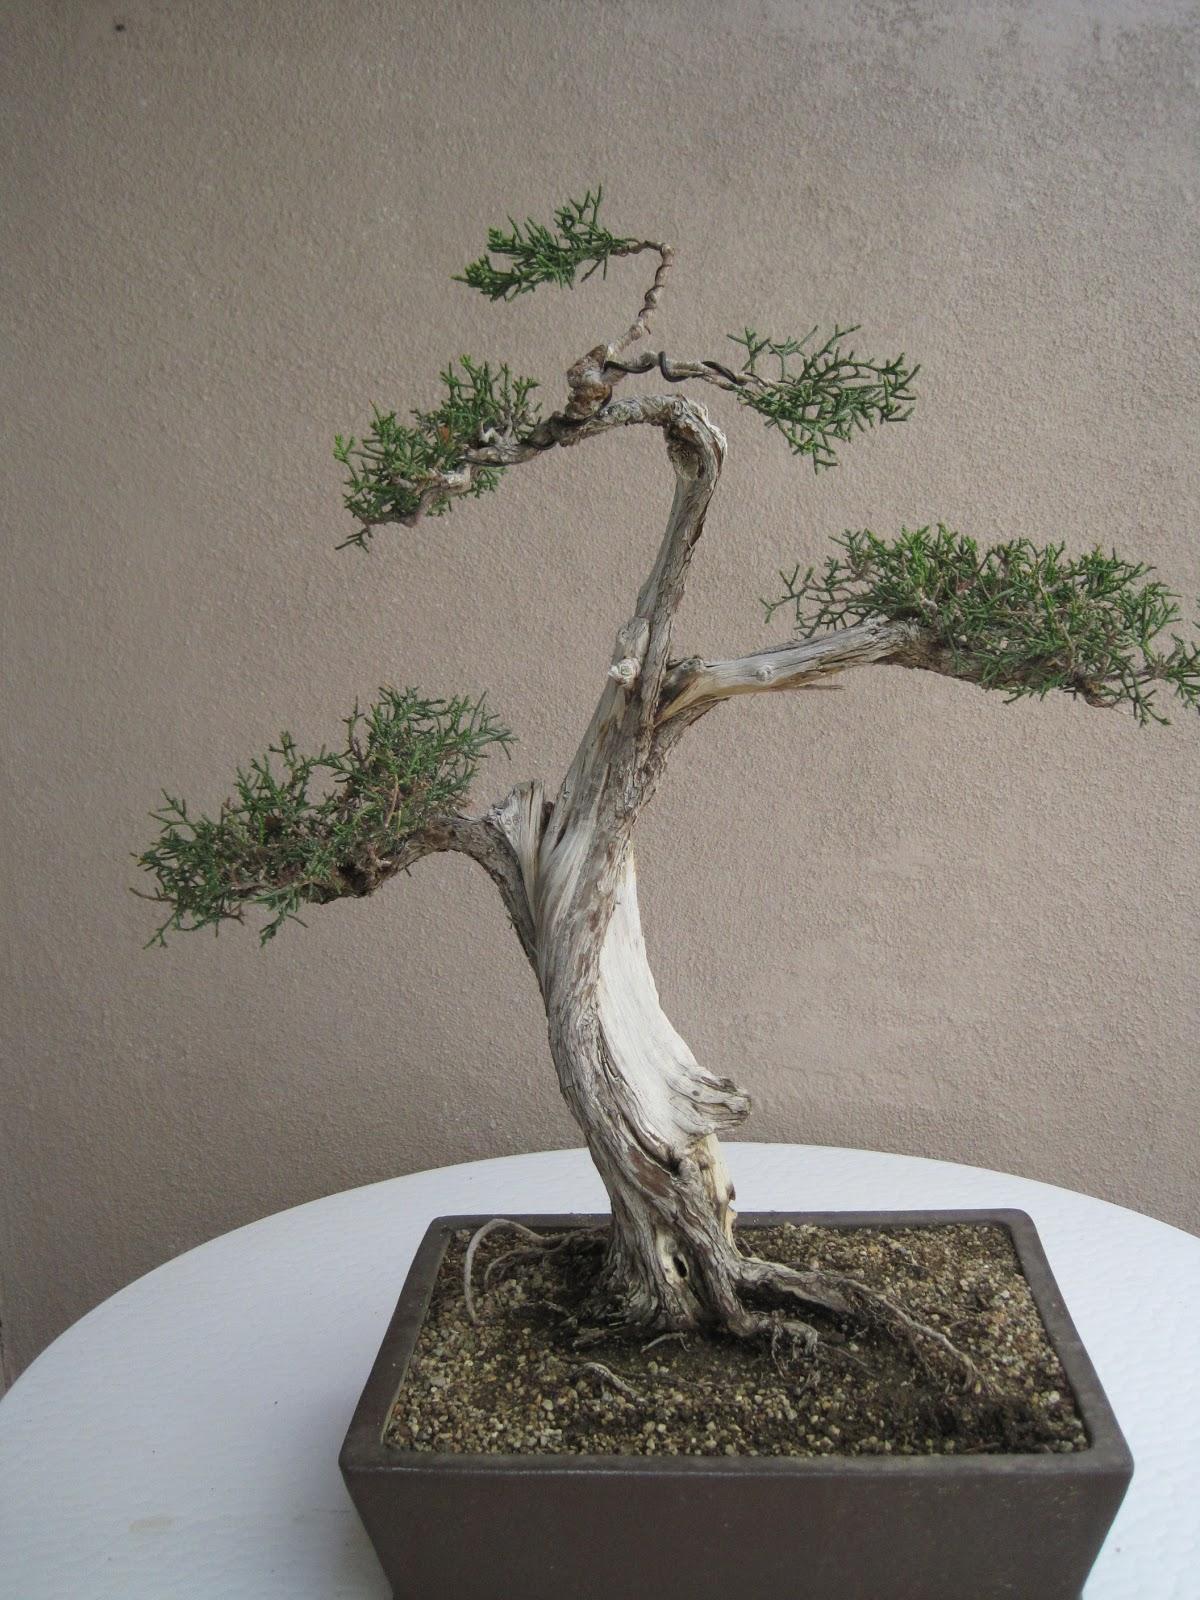 ShoChiku Bai Bonsai Club UPDATED BONSAI TREES FOR SALE As Of 05